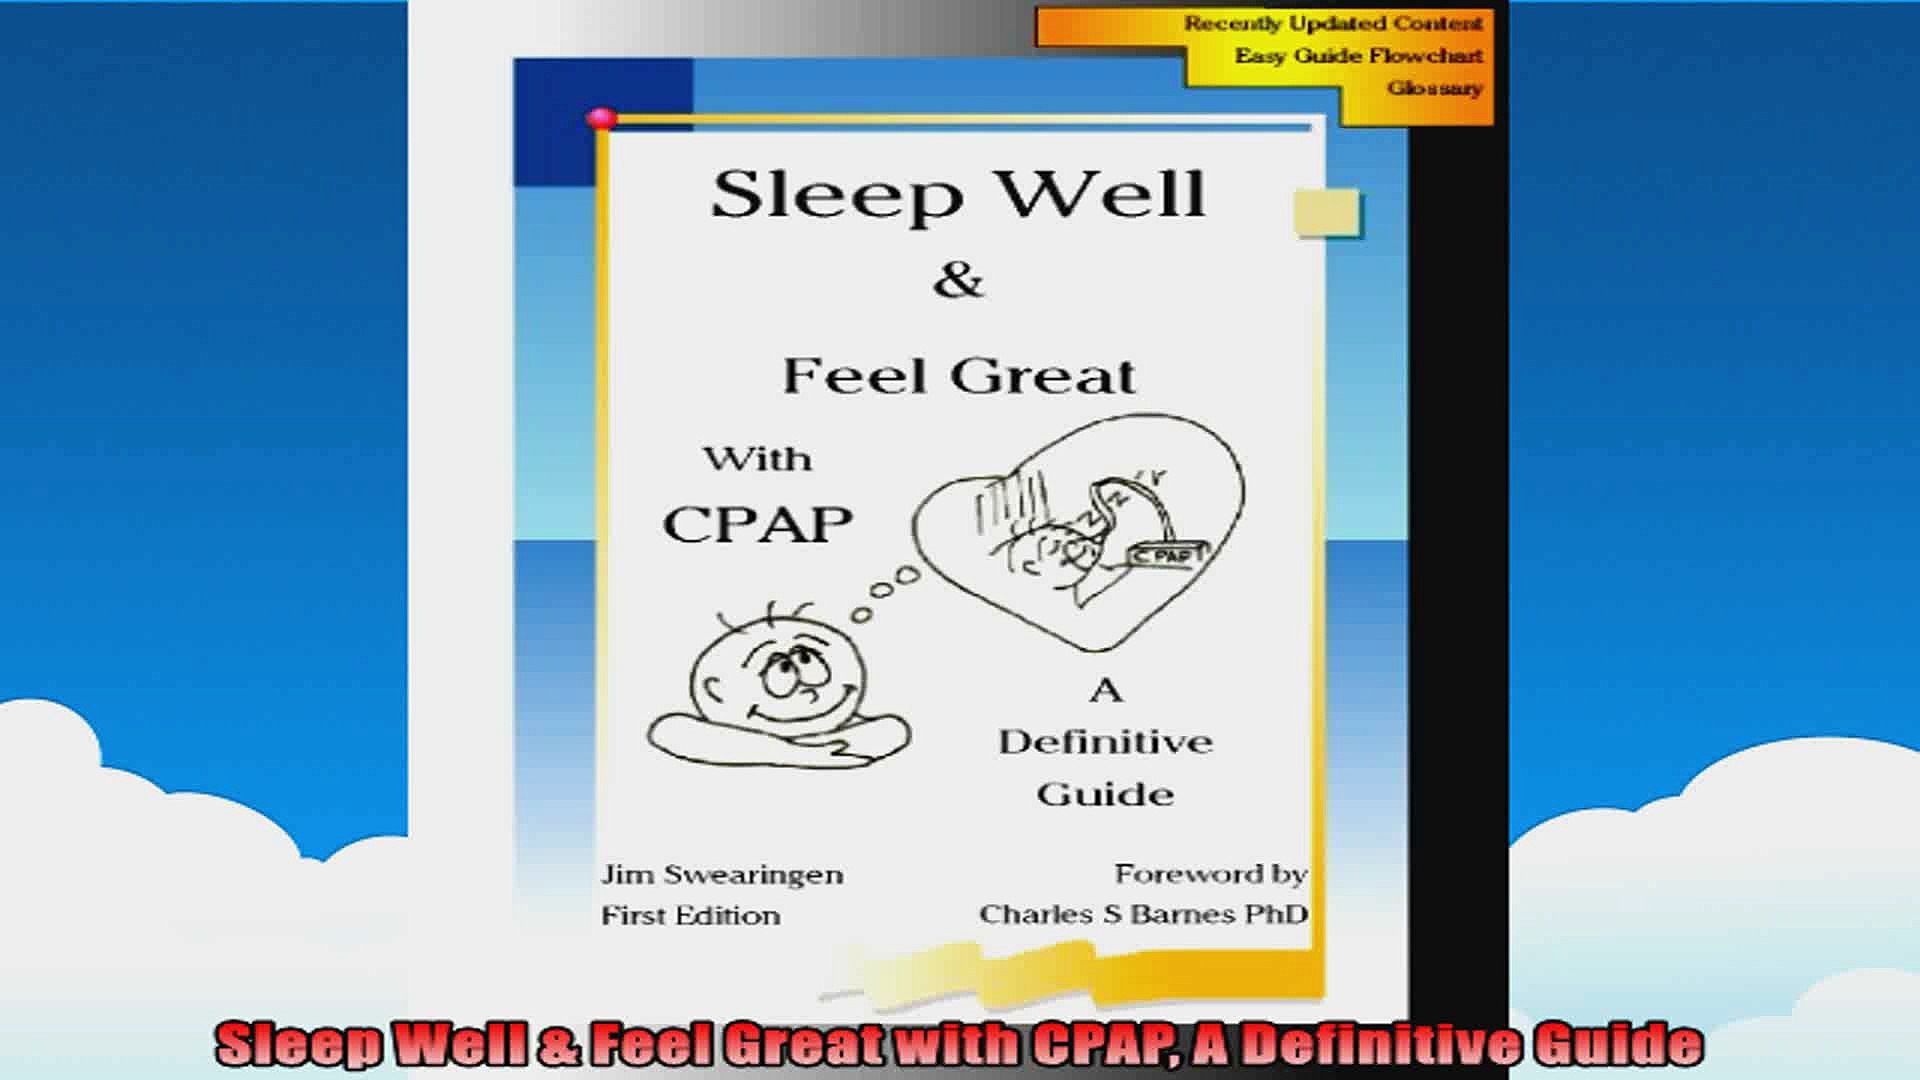 Sleep Apnea Signs: Snoring, Gasping, Sleepiness